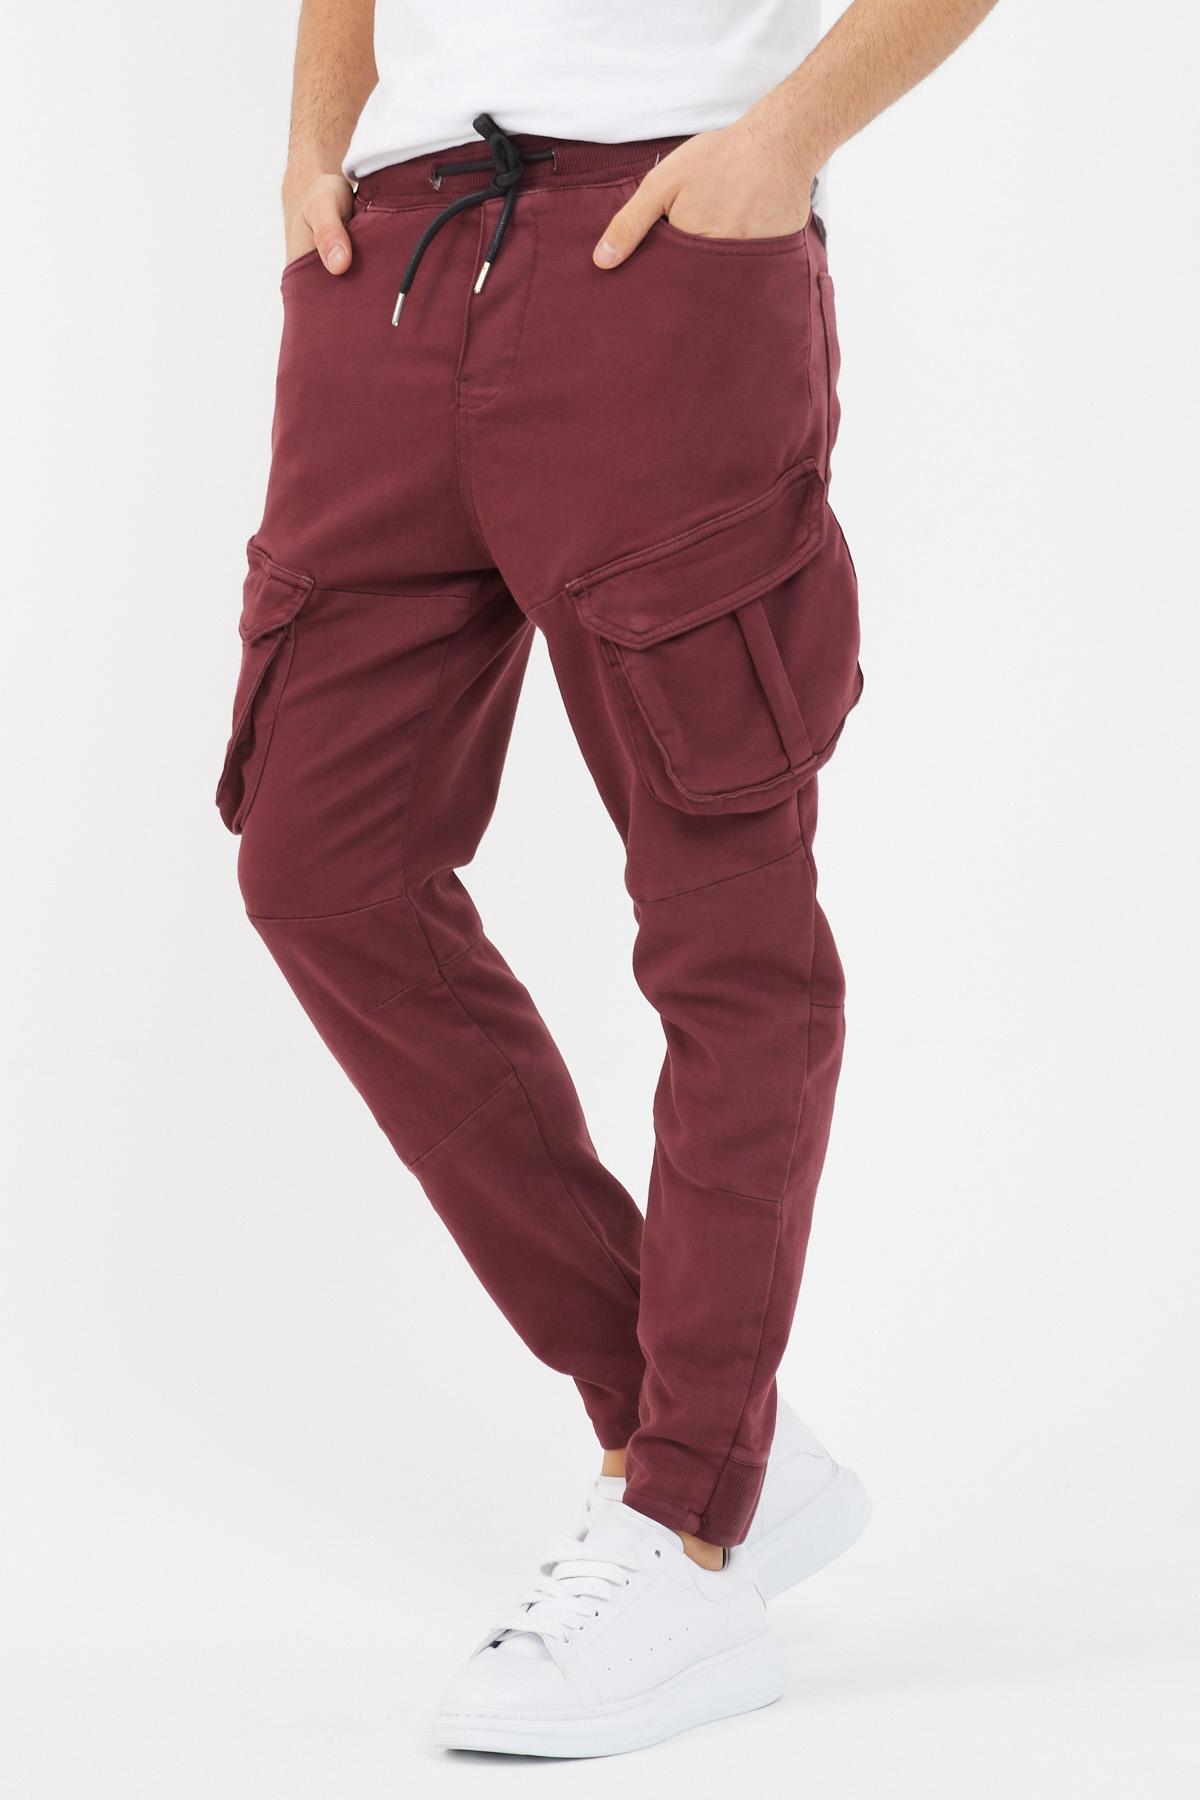 XHAN - Bordo Kargo Cepli Pantolon 1KXE5-44494-05